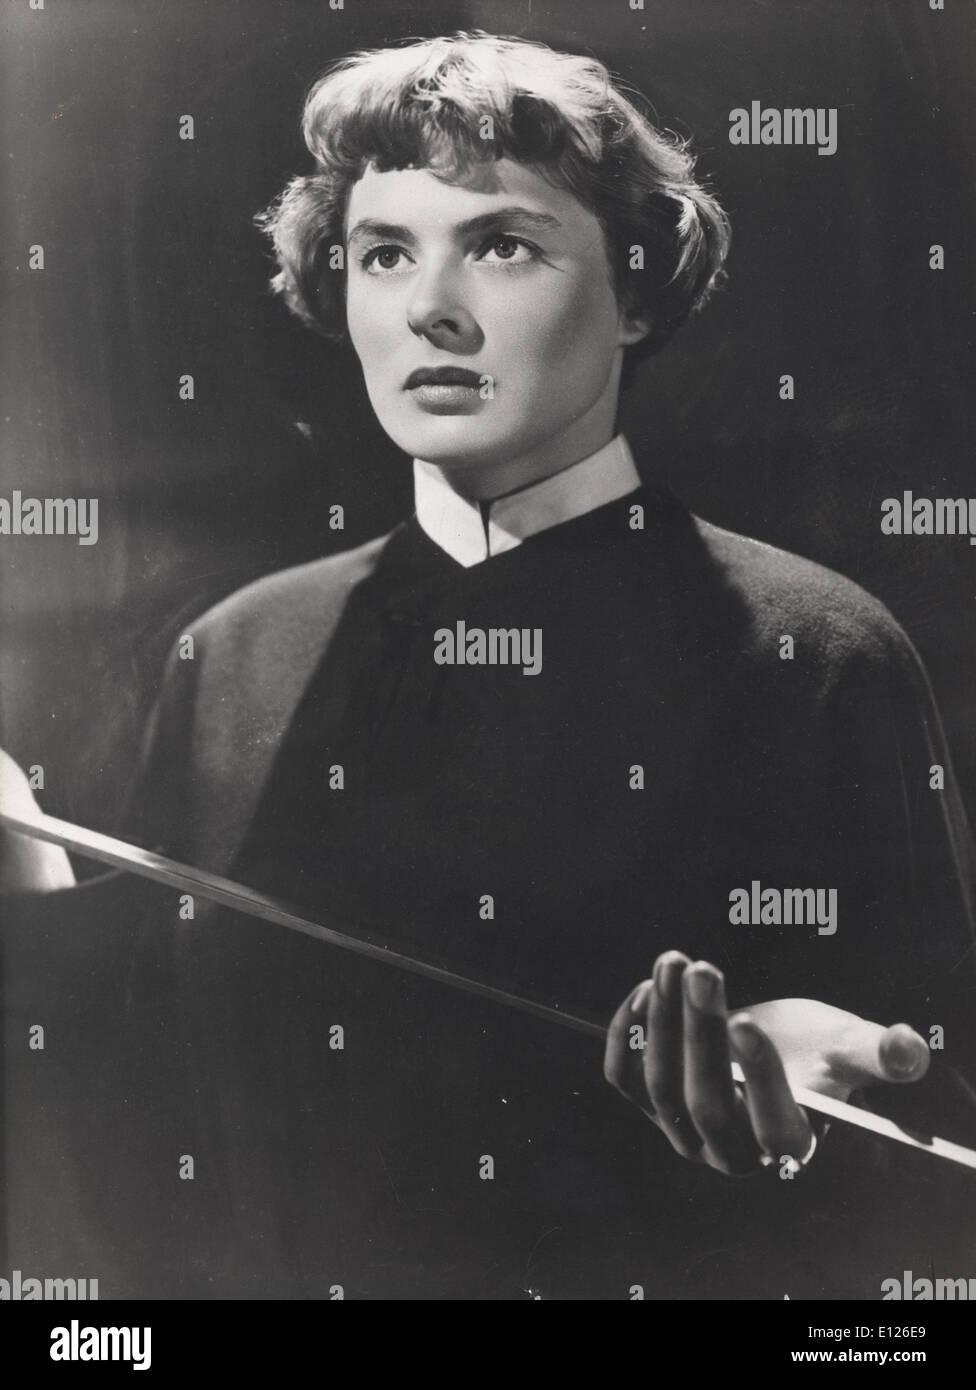 Nov 19, 2007 - London, England, UK - Ingrid Bergman at dress rehearsal of 'Joan or Arc' 1948 - Stock Image